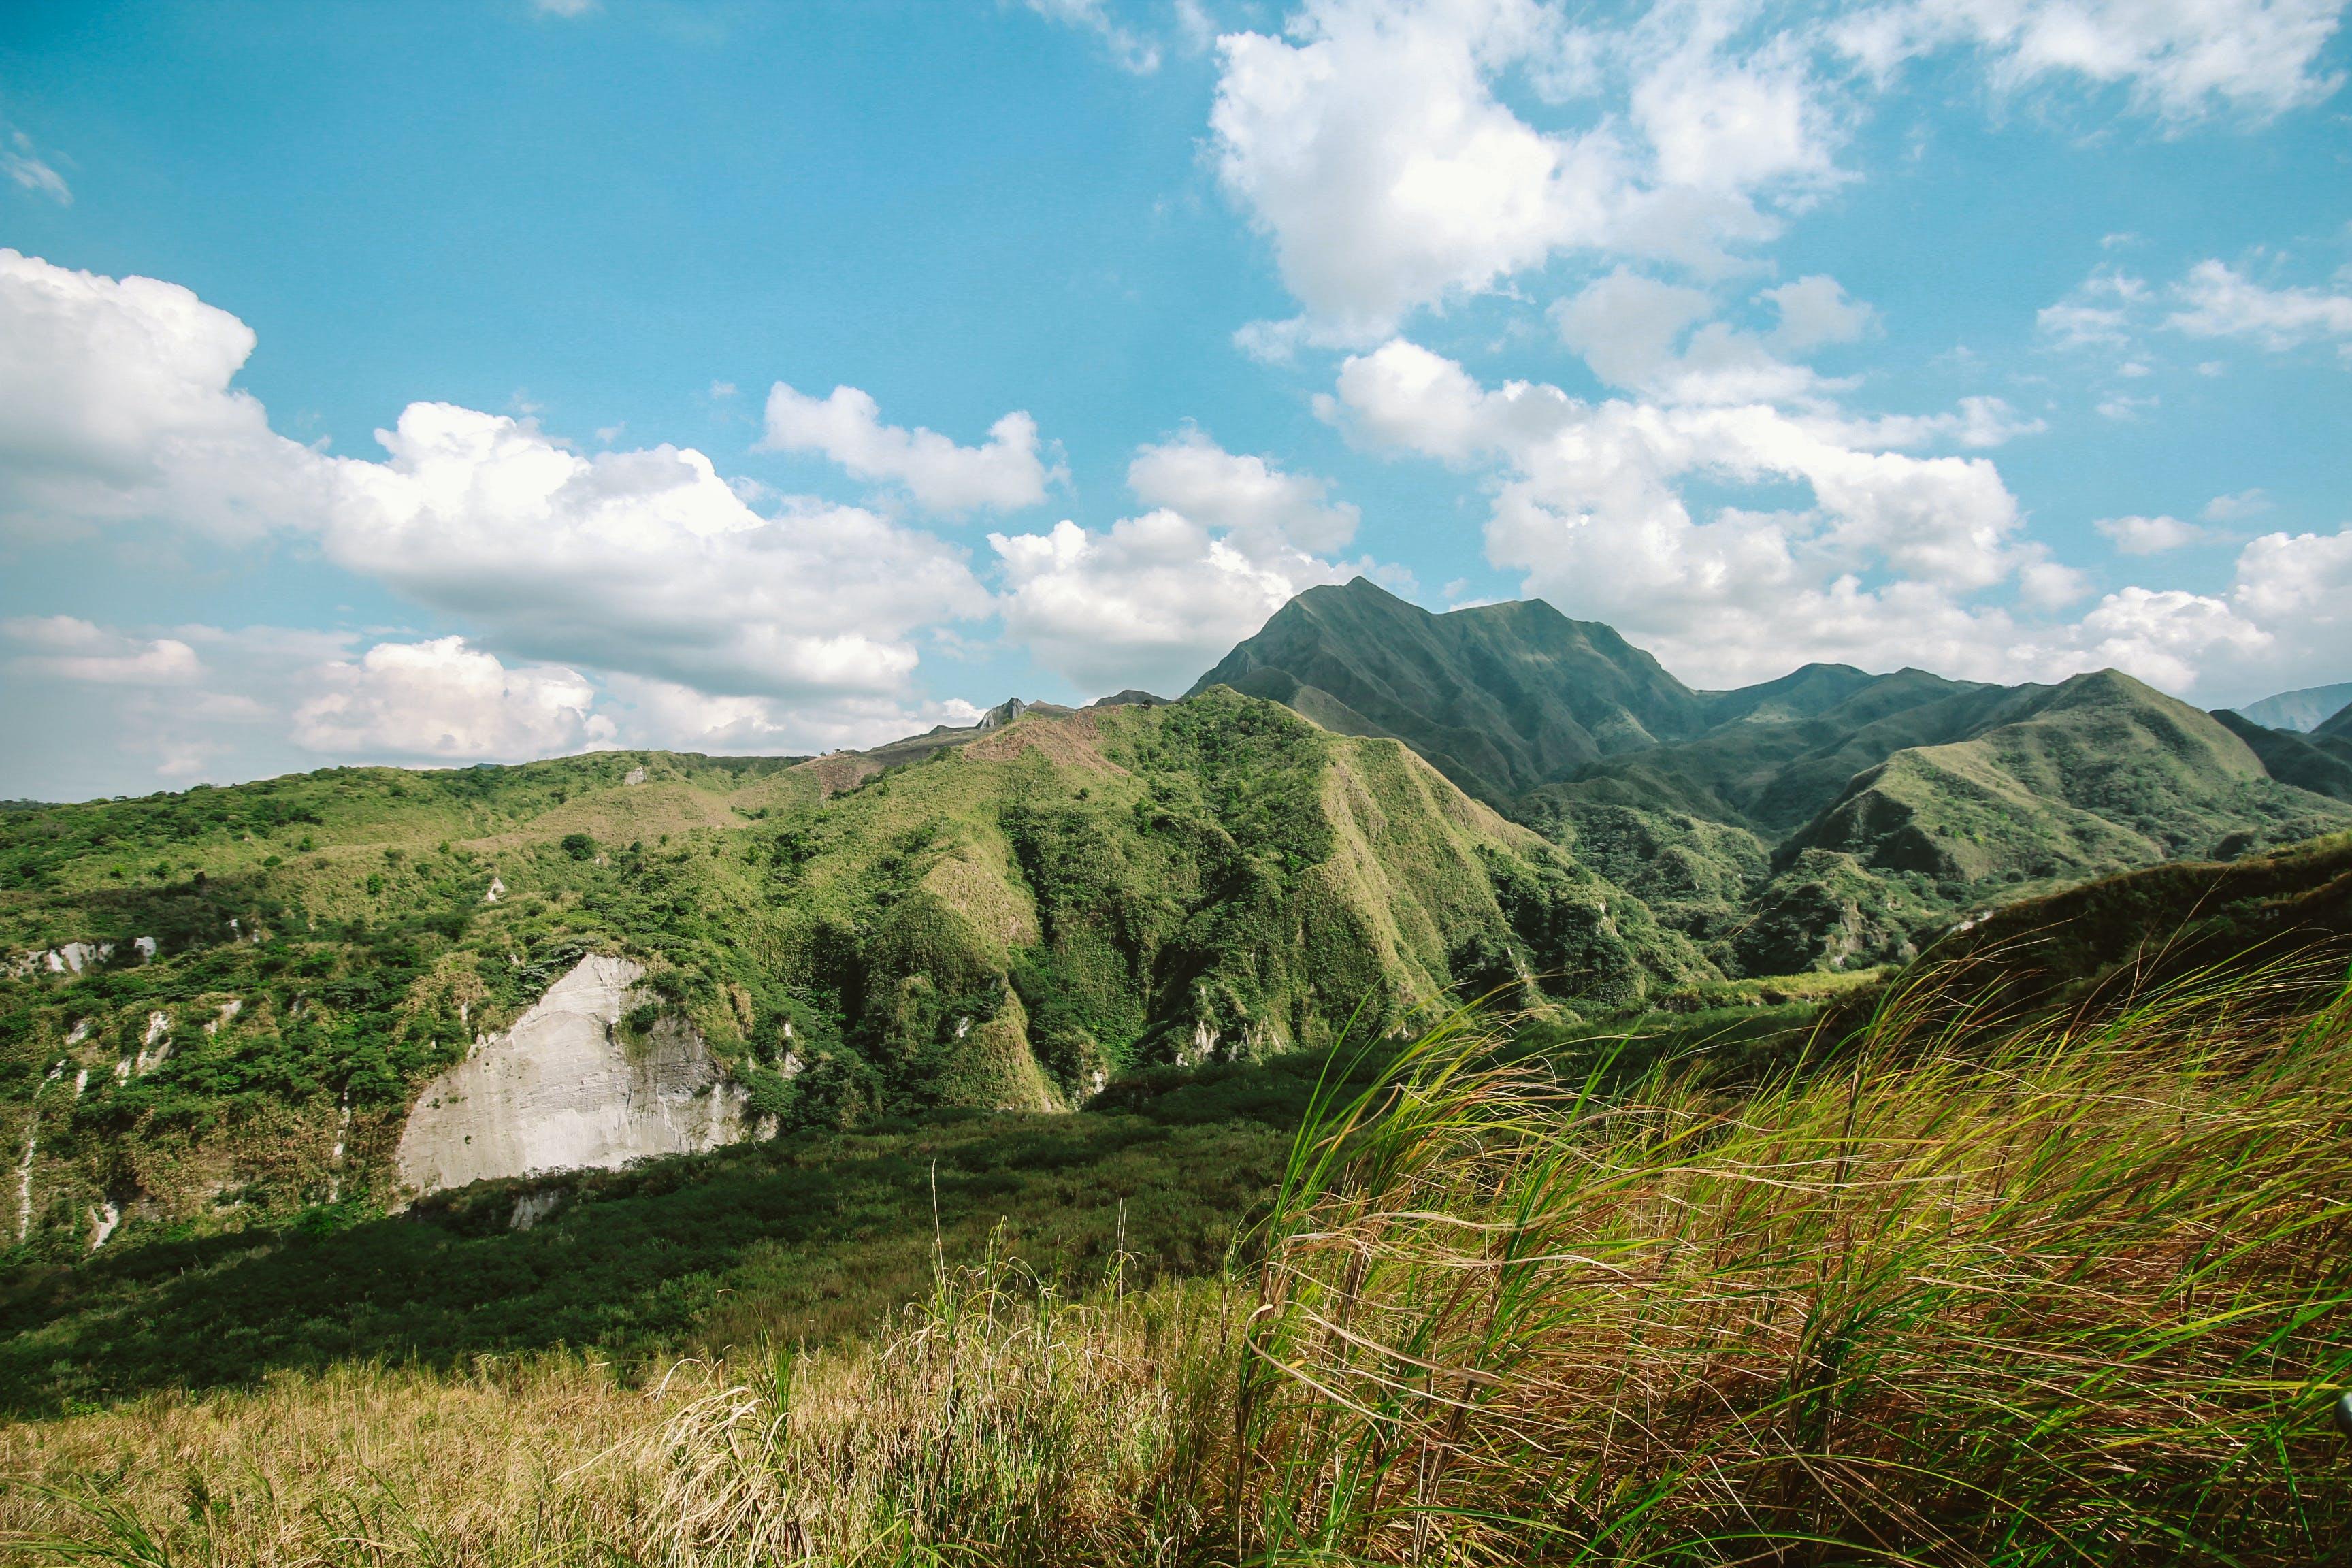 Kostenloses Stock Foto zu berge, friedvoll, gras, himmel